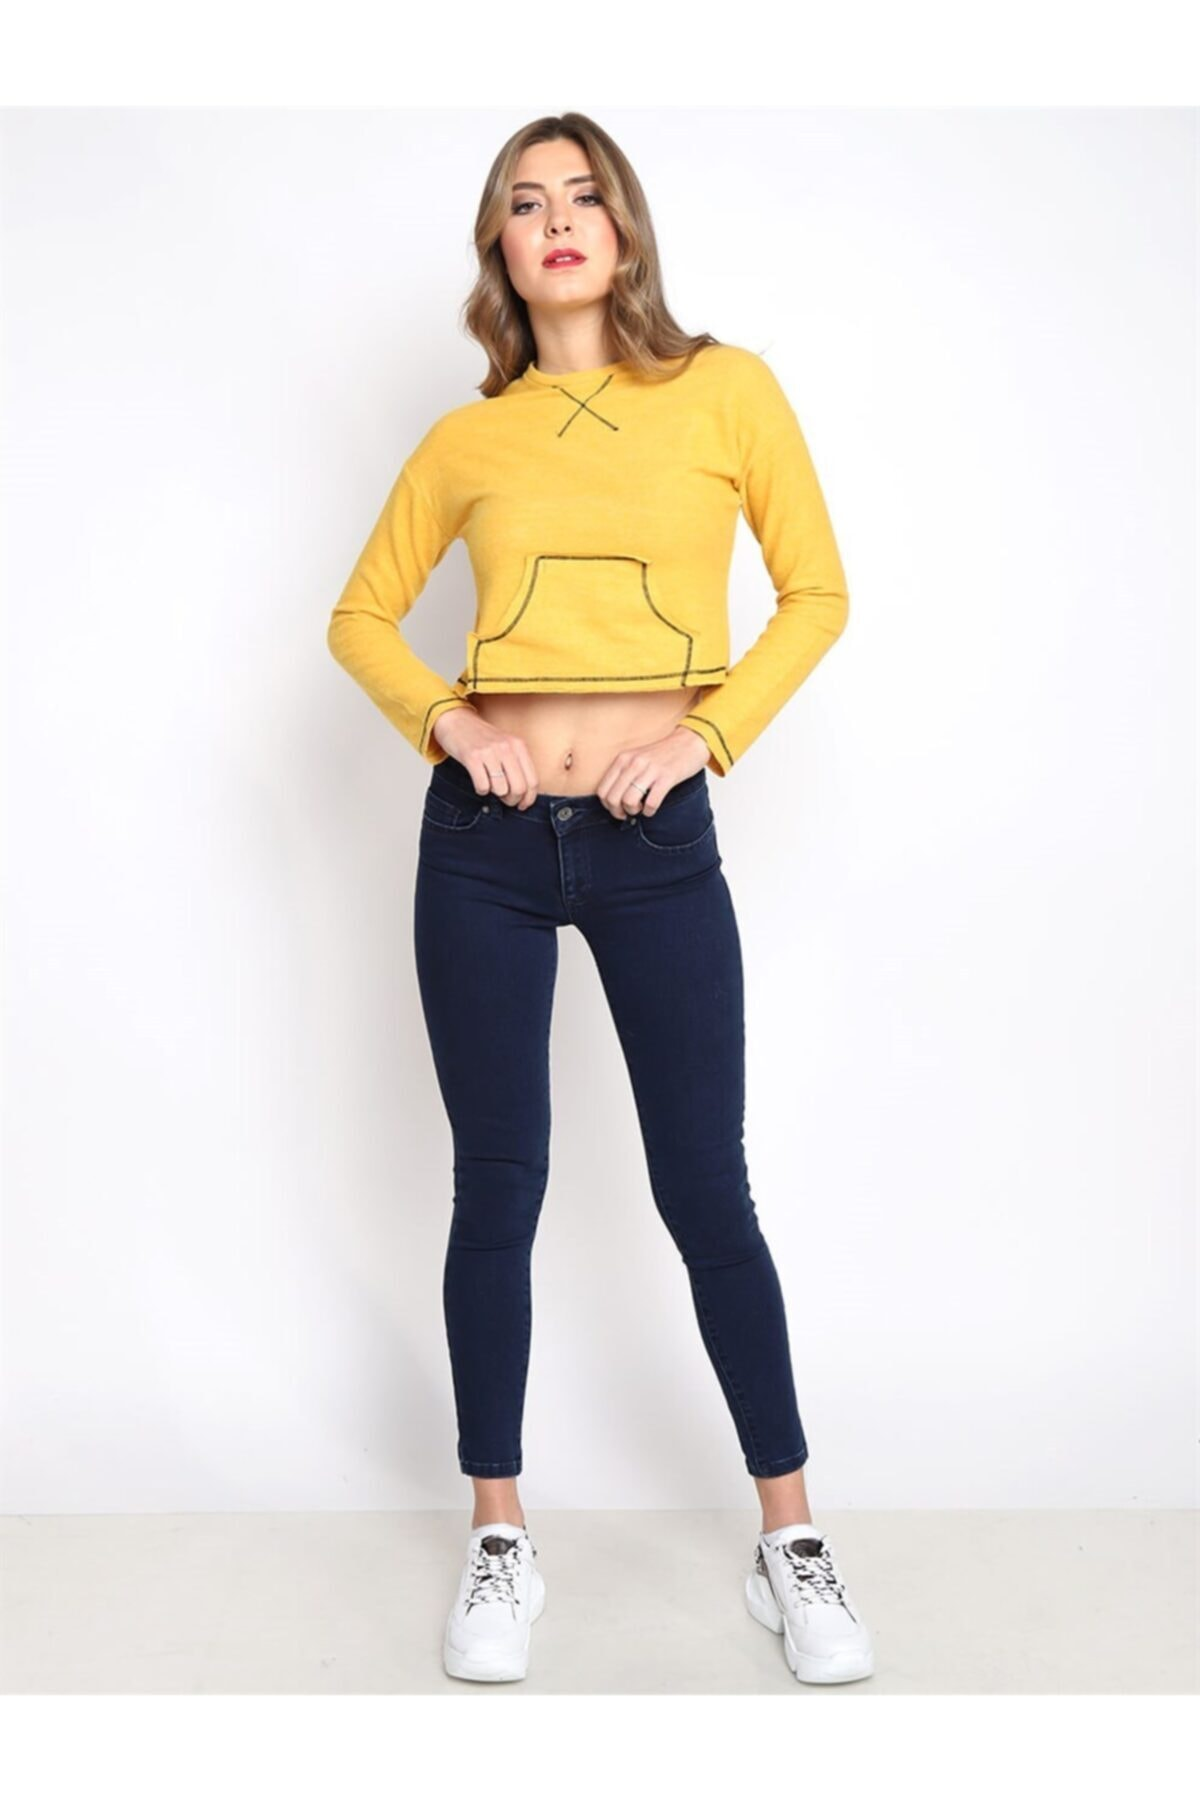 Twister Jeans Kadın Slim Fit Orta Bel Pantolon Lıma 9046-36 36 1